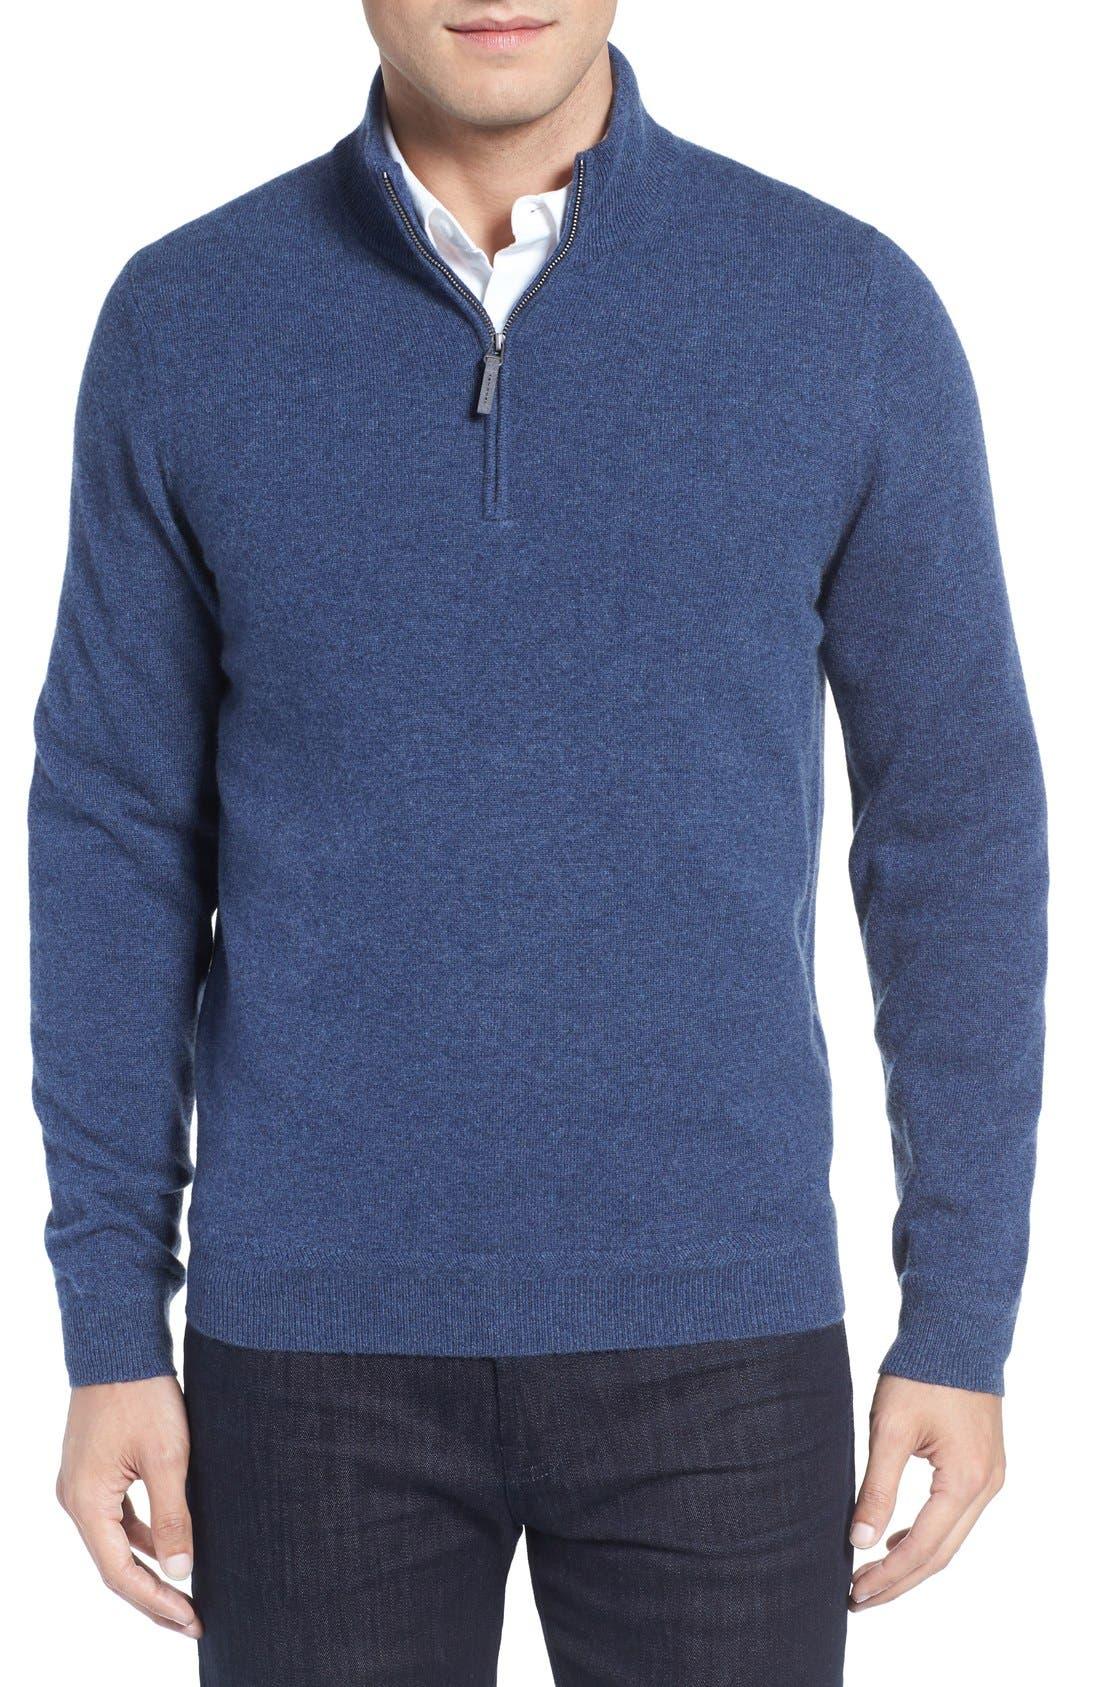 JOHN W. NORDSTROM® Quarter Zip Cashmere Sweater